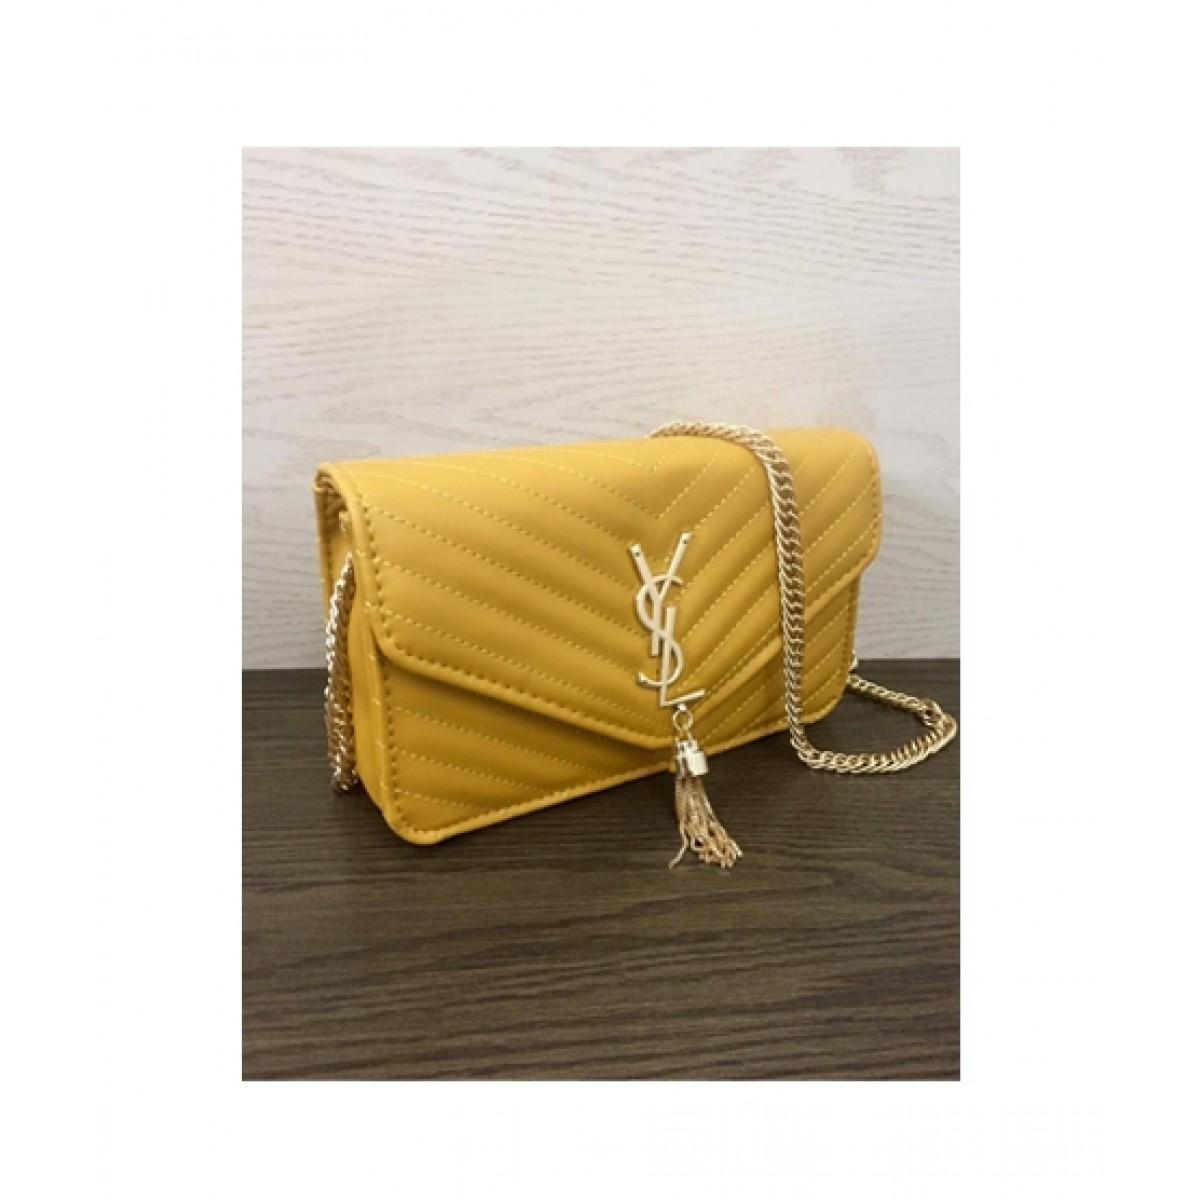 HM Cross Body Bag For Women Yellow (0019)